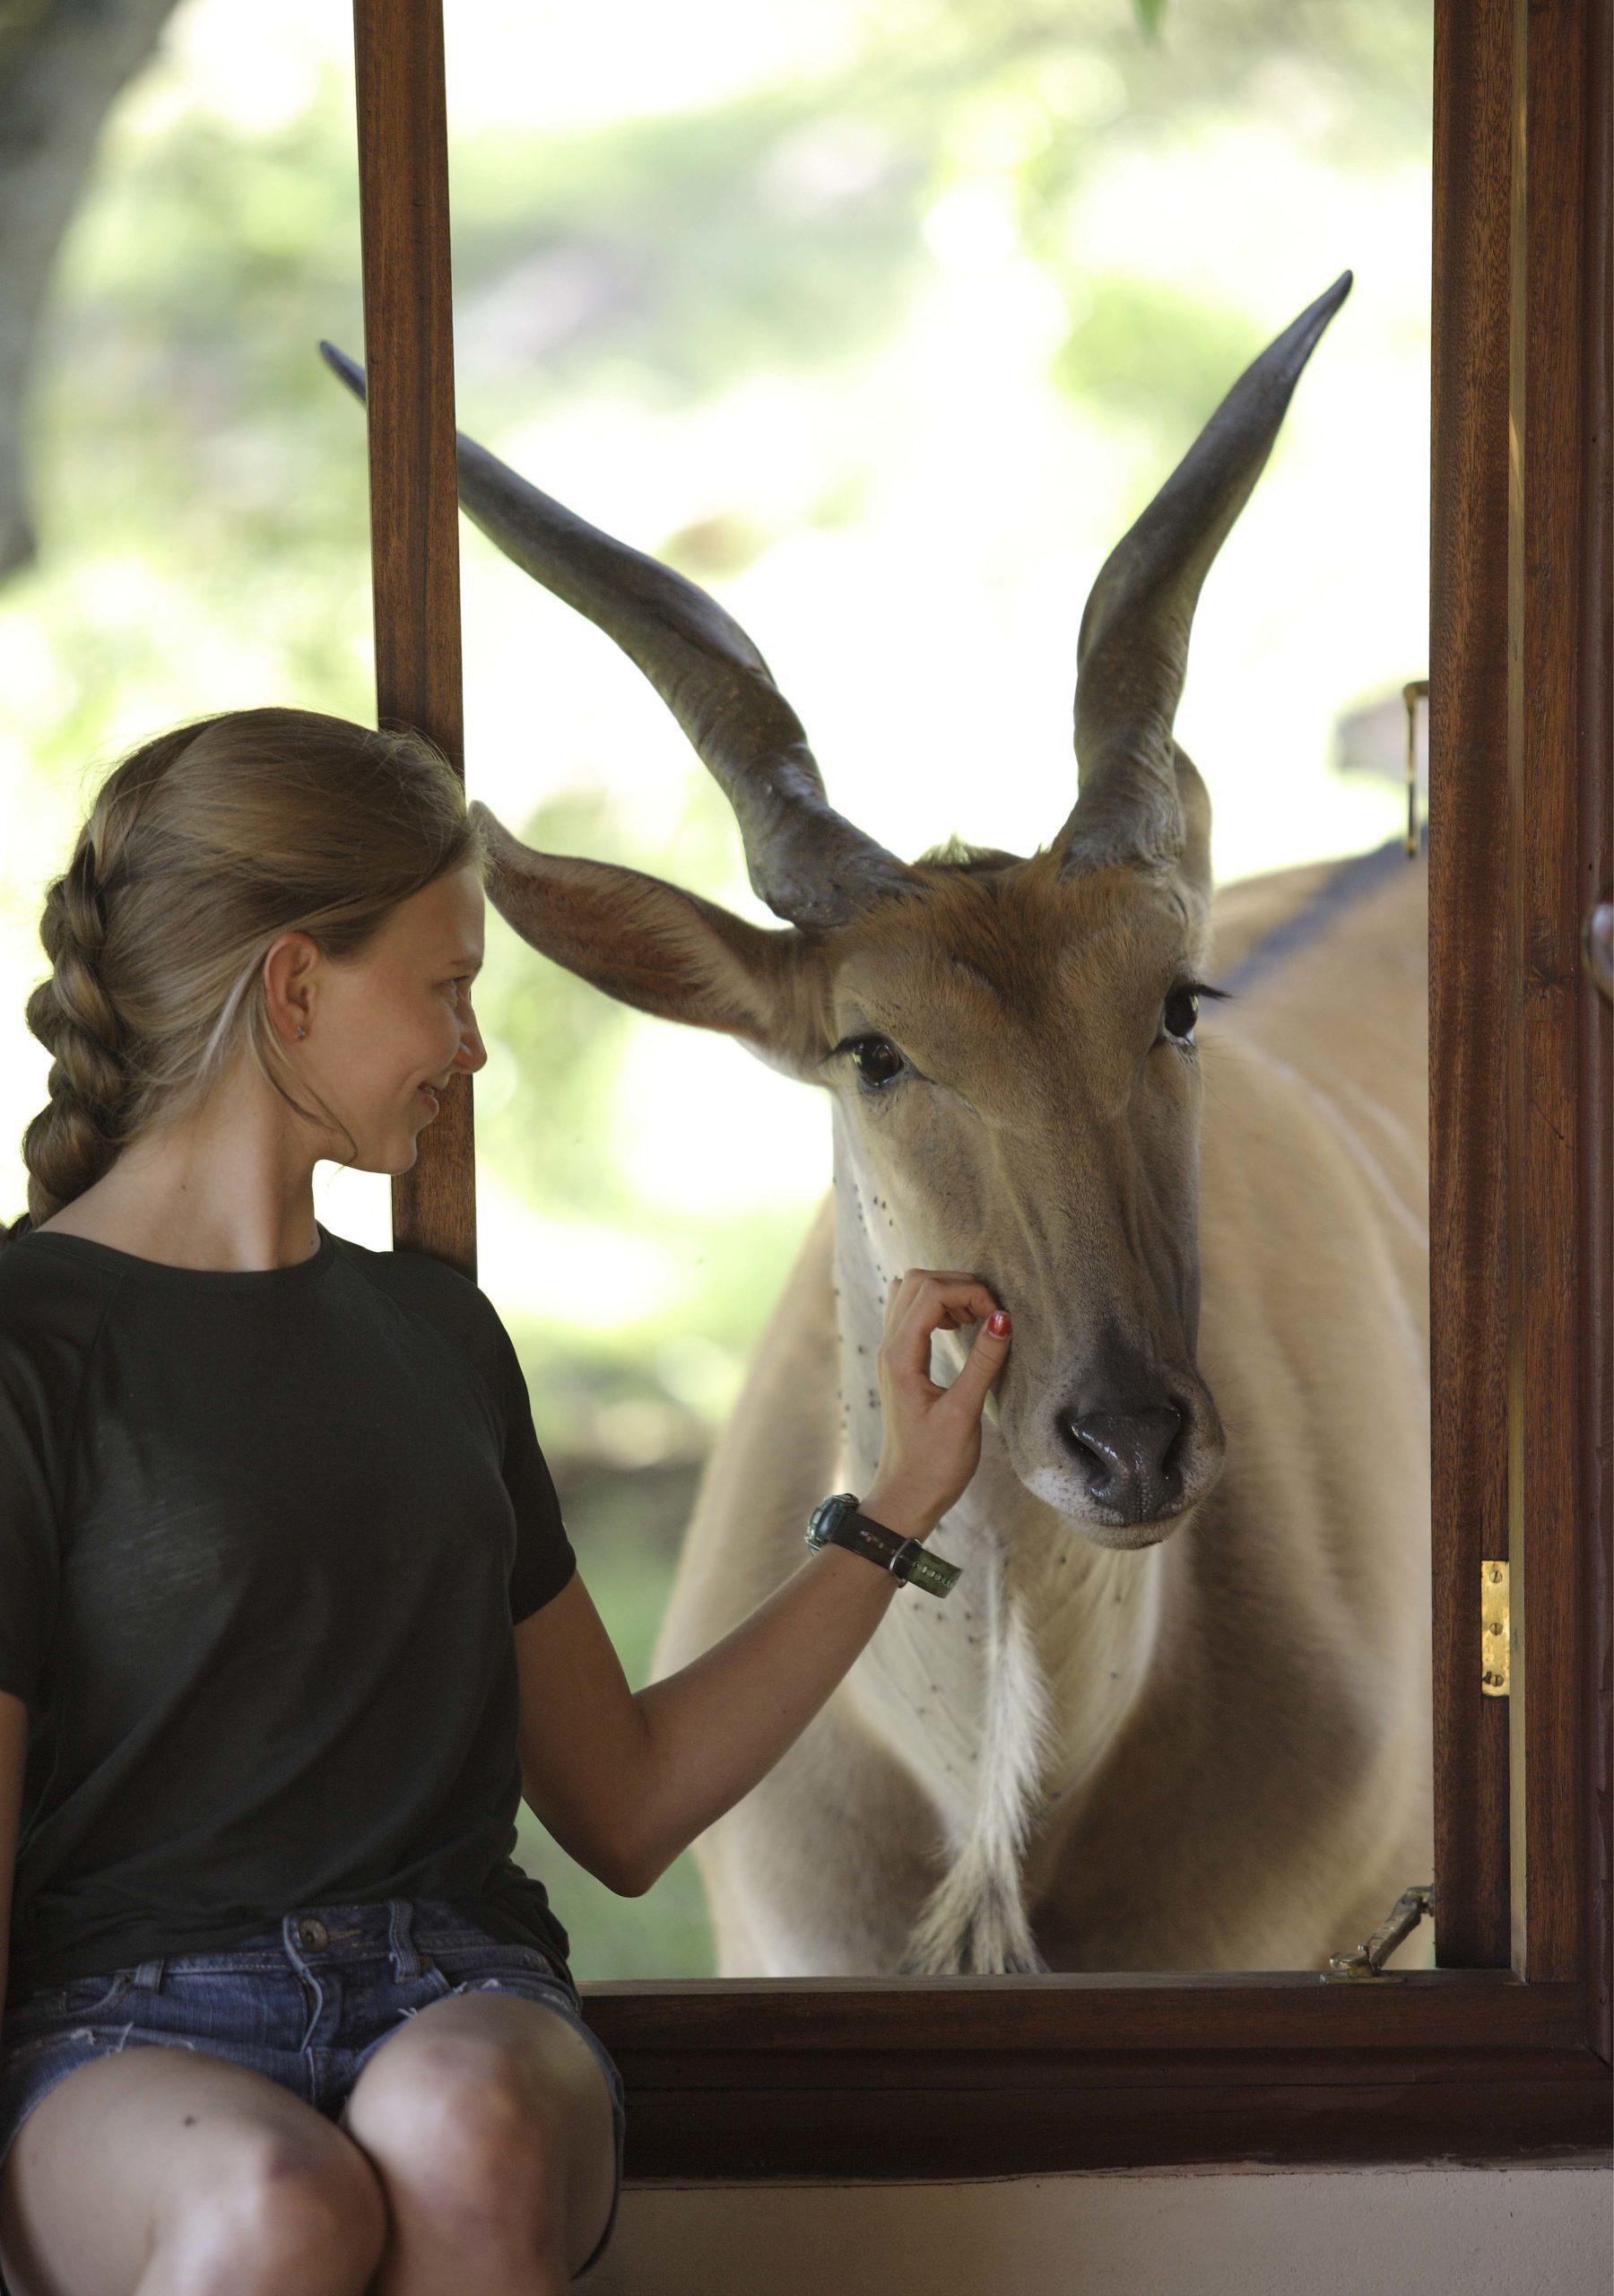 Young girl petting an Eland through a window